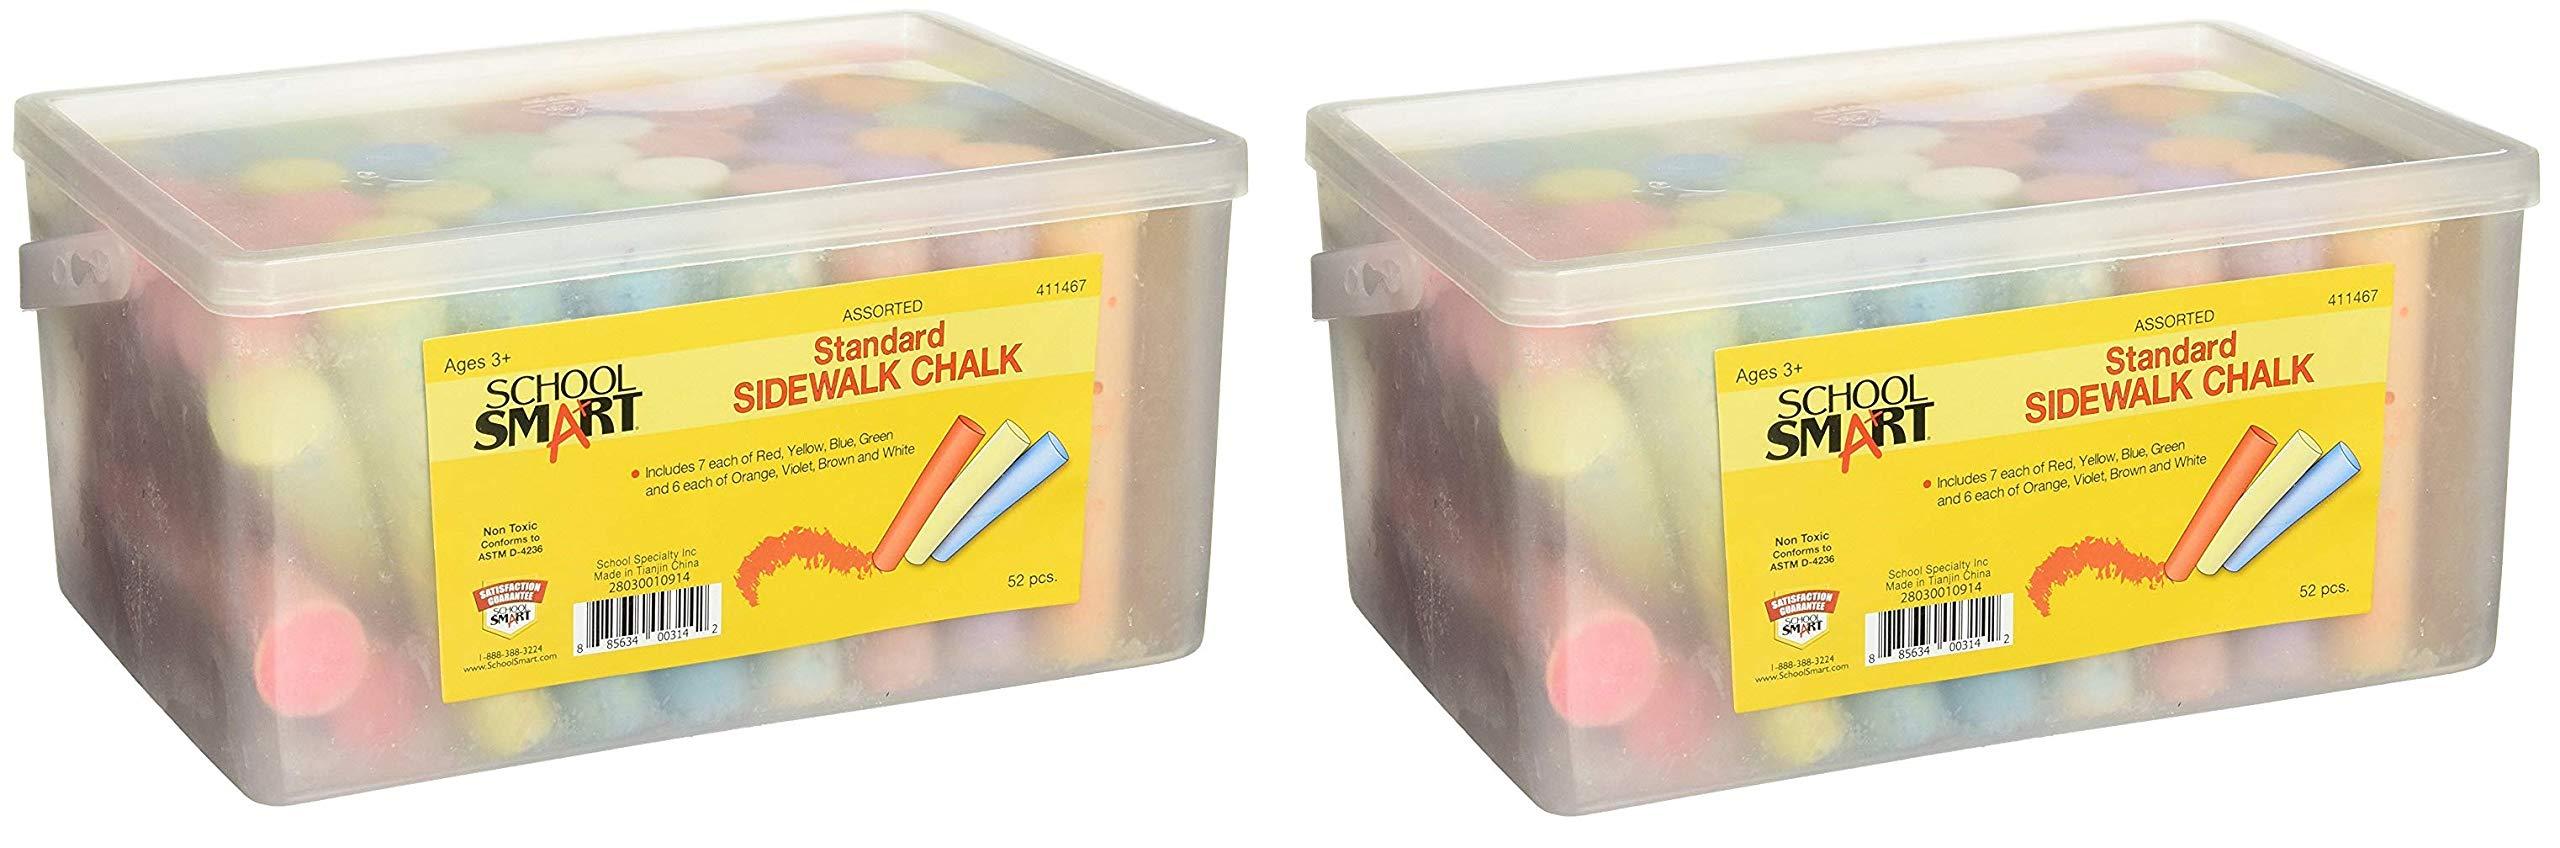 School Smart Sidewalk Chalk - 1 x 4 inches - Set of 52 - Assorted Colors (Тwo Рack)